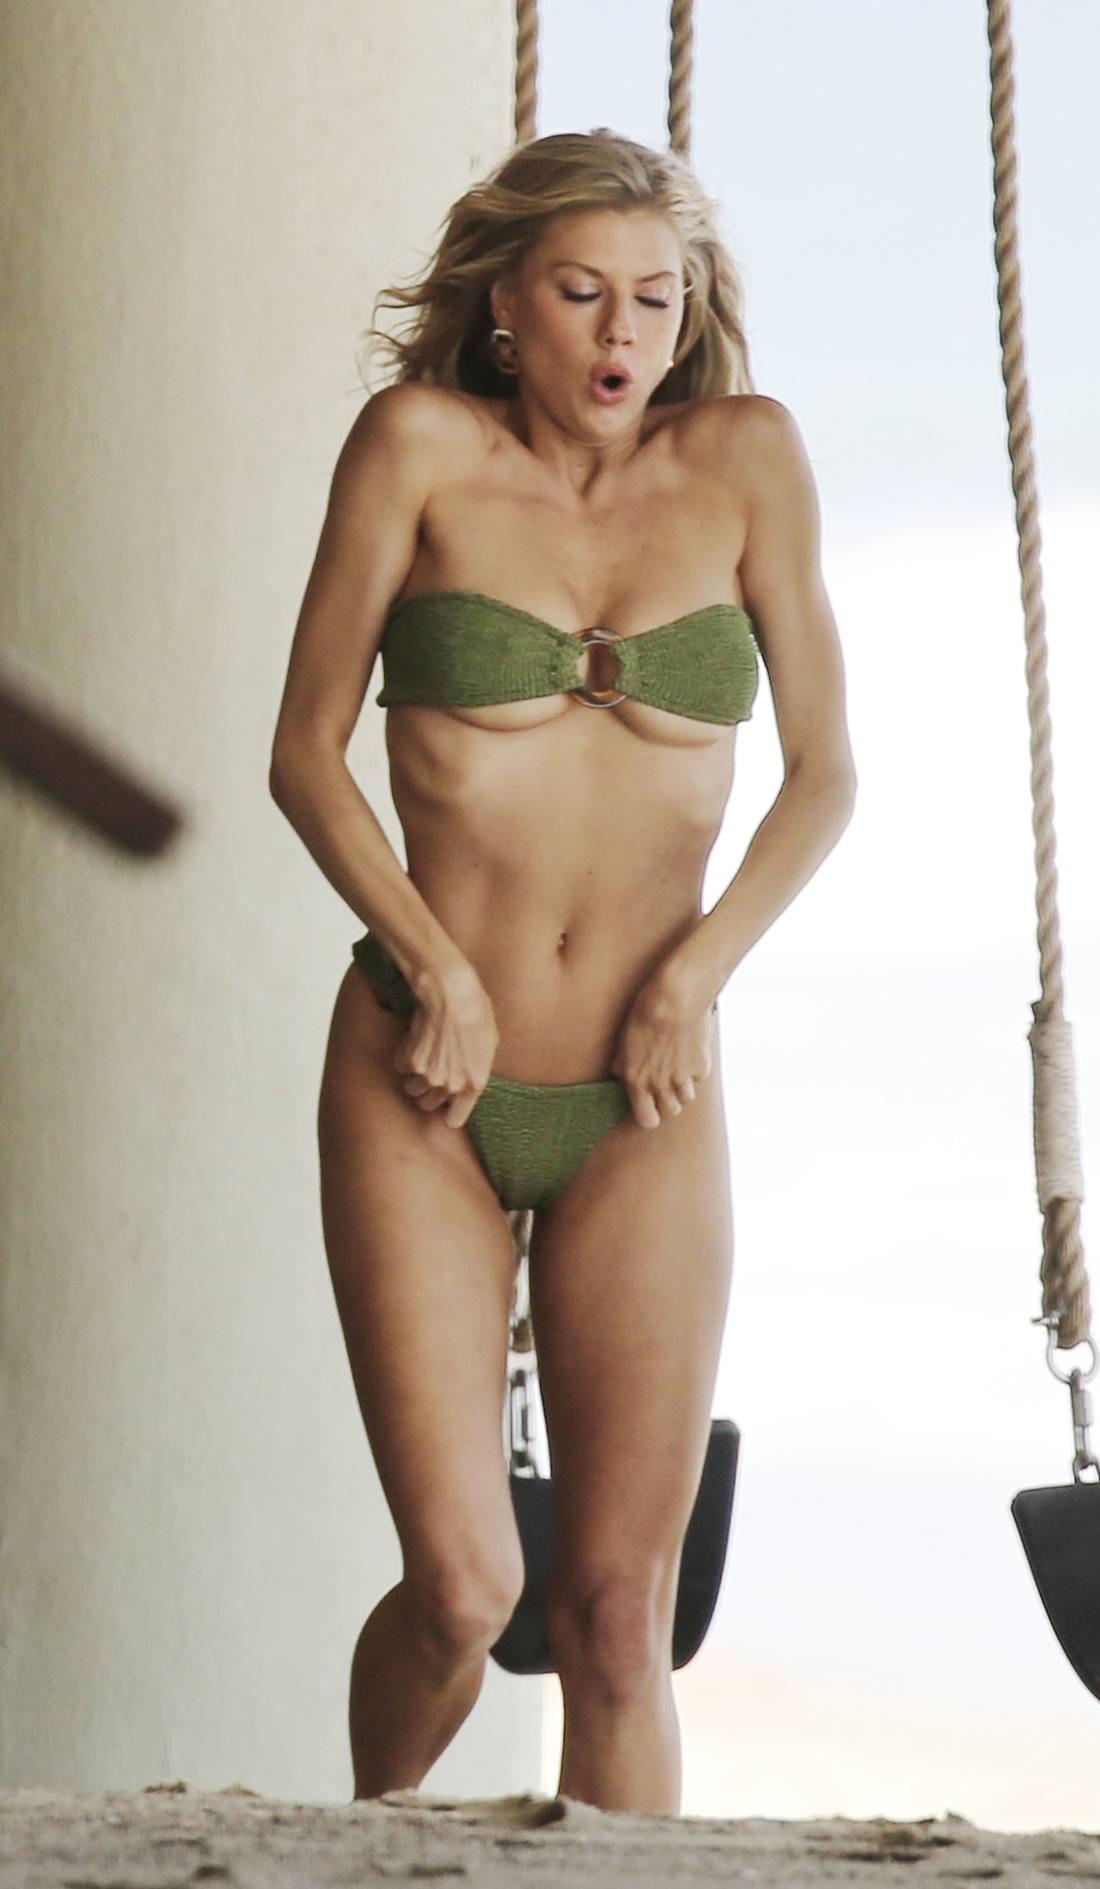 Charlotte Mckinney – Sexy Boobs In Tiny Bikini On The Beach In Los Angeles 0002